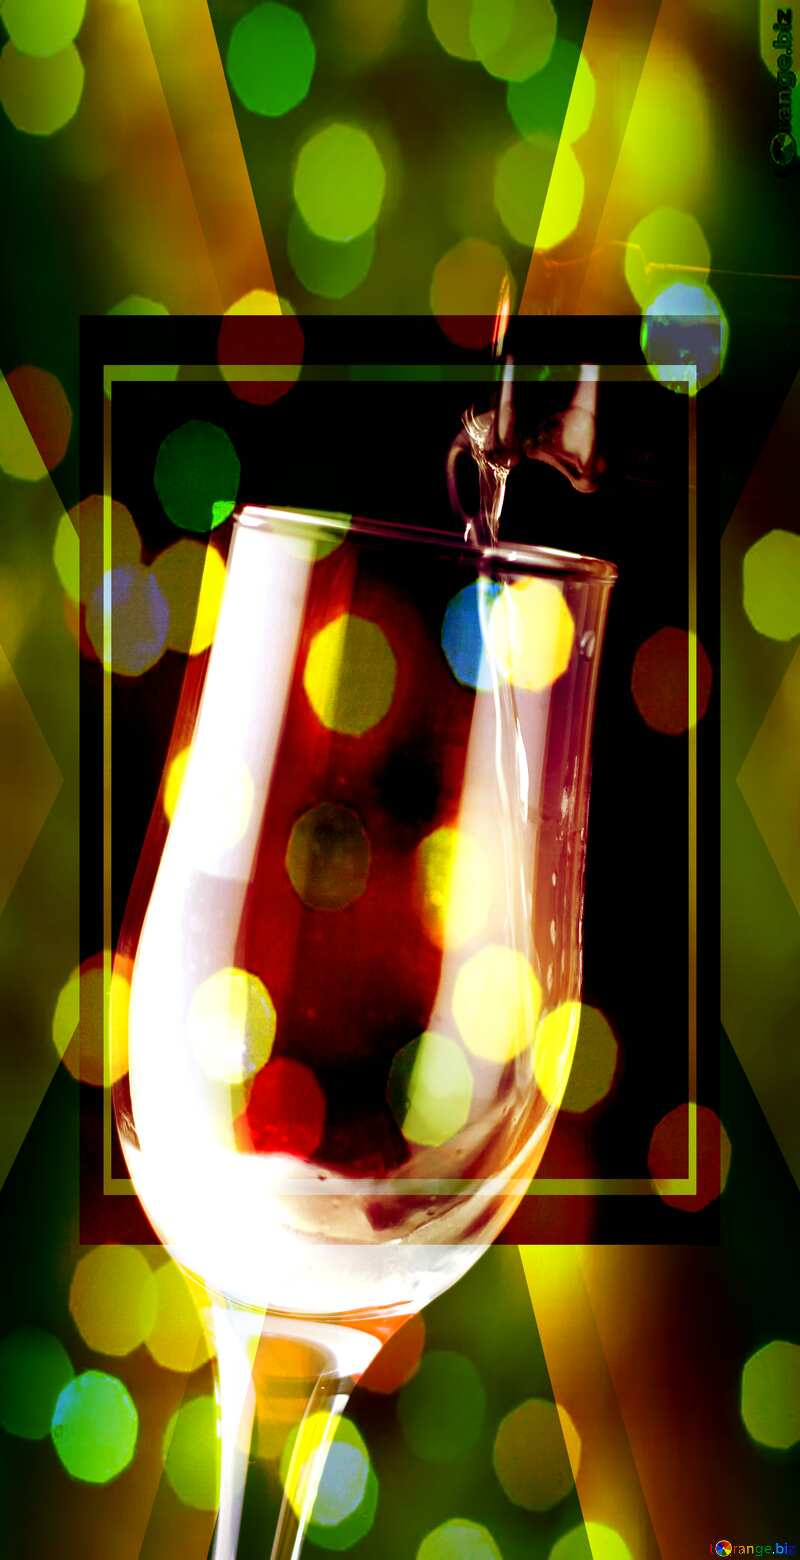 Foamy wine Wedding card background powerpoint website infographic template banner layout design responsive brochure business №25778